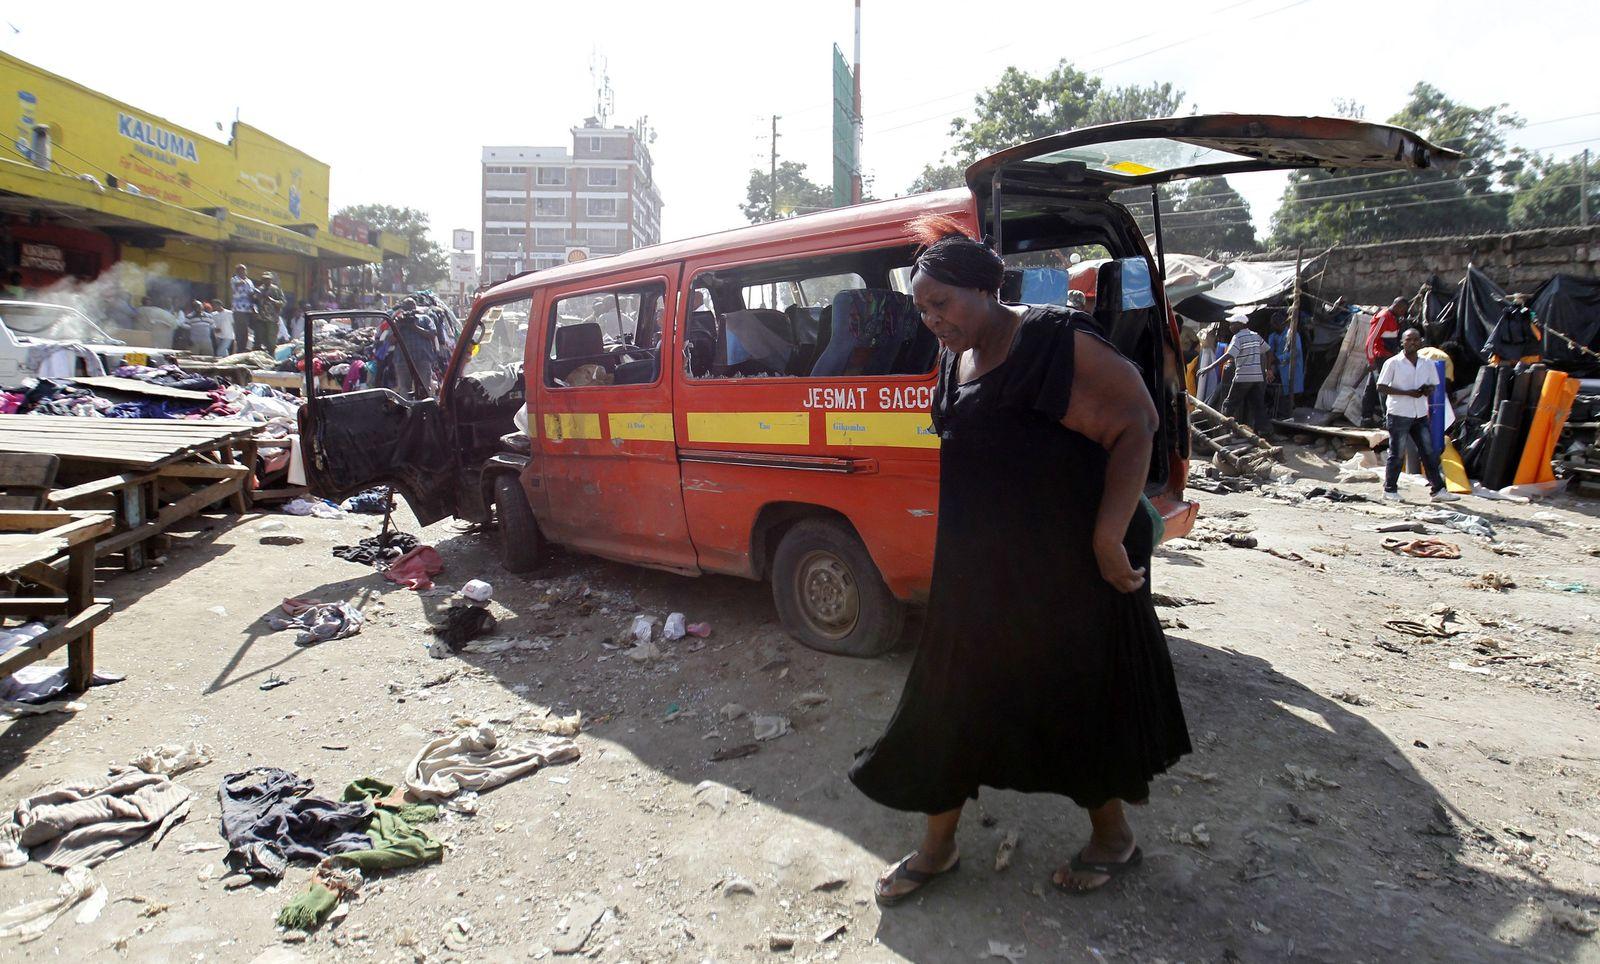 Kenia/Nairobi